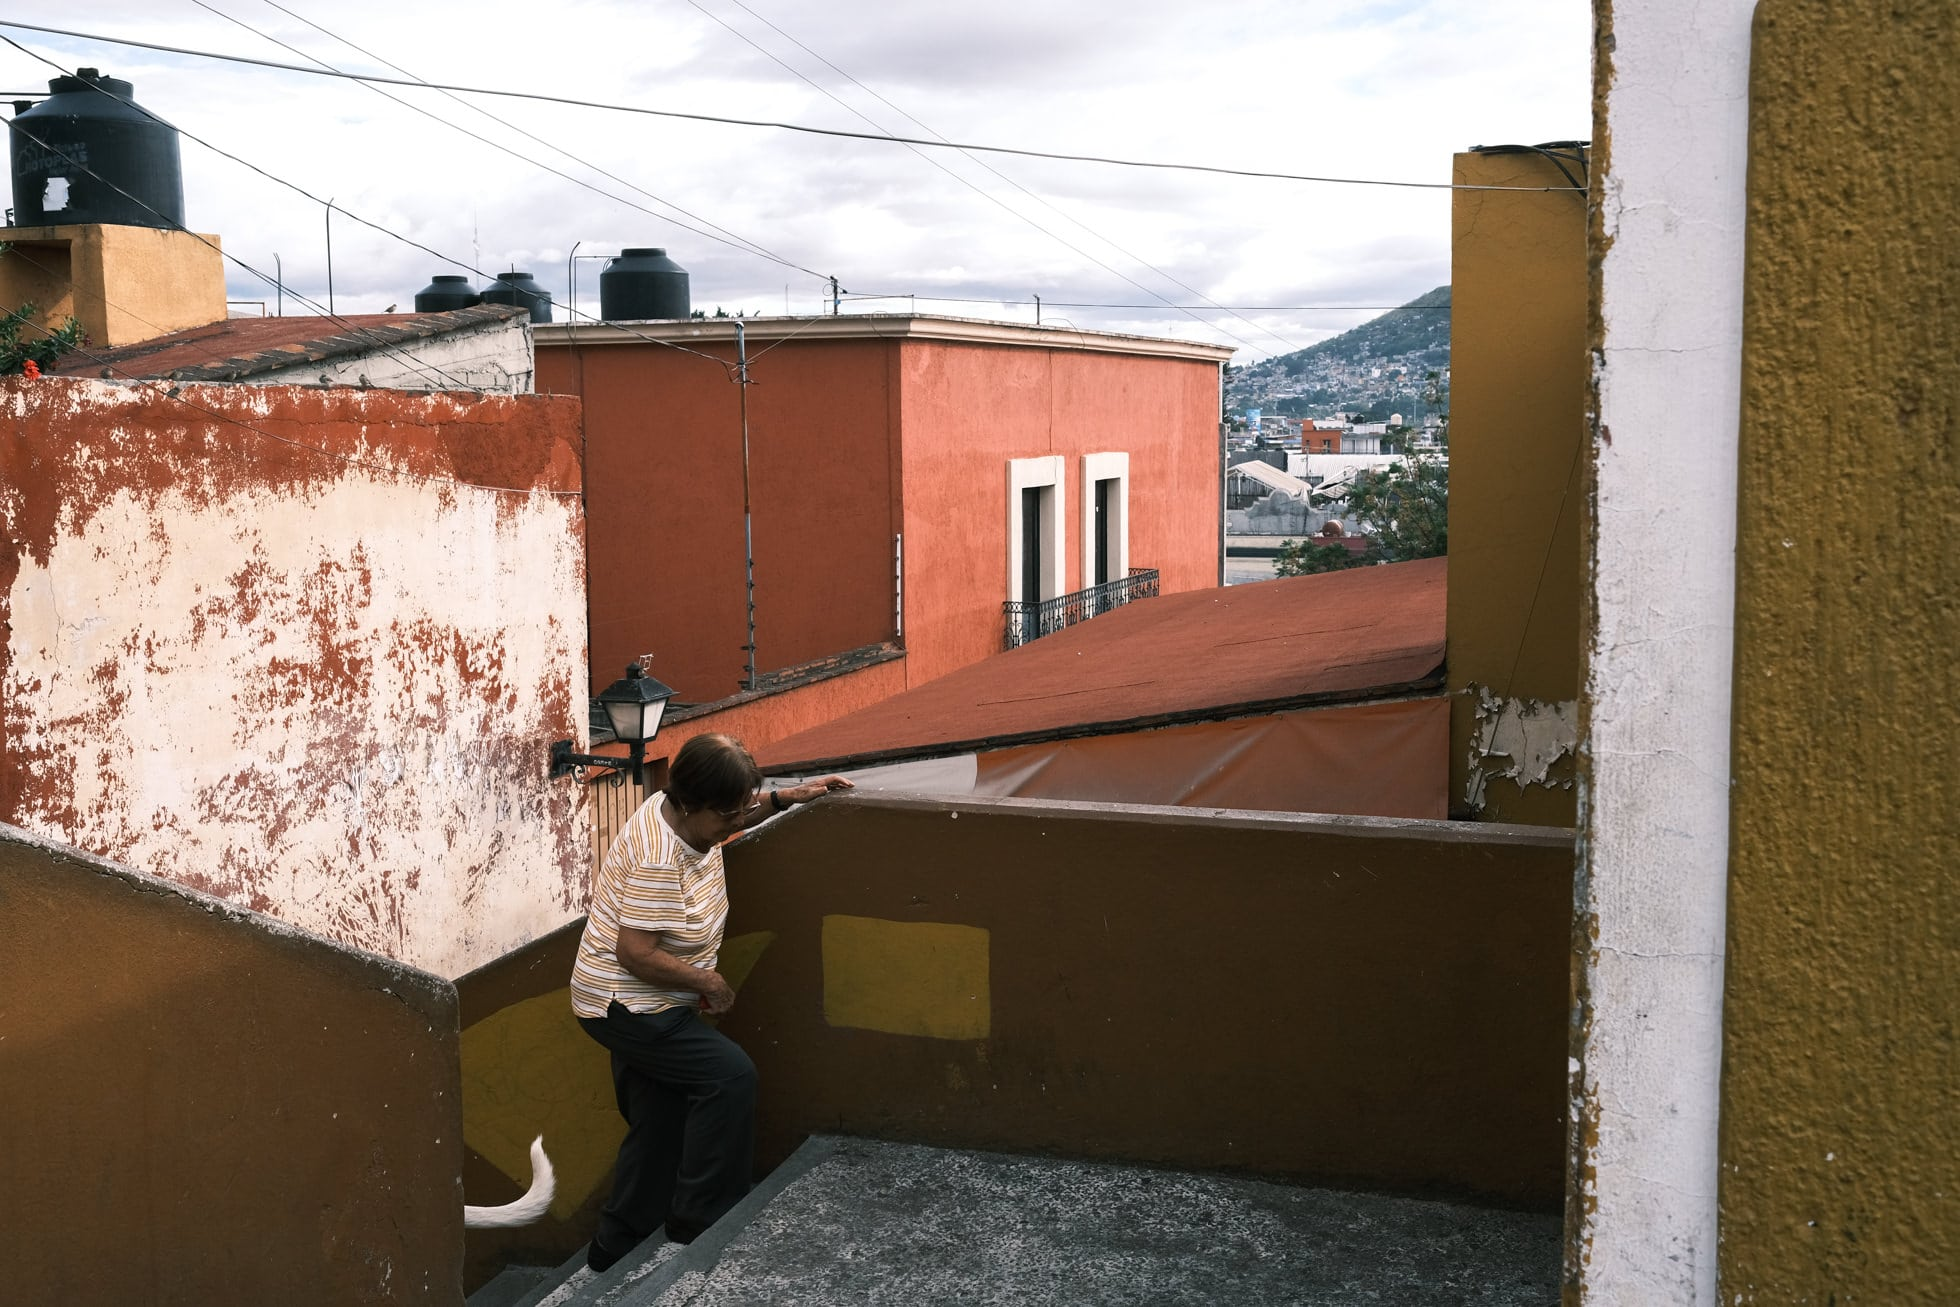 fujifilm-x-pro3-mexico-street-photography-78